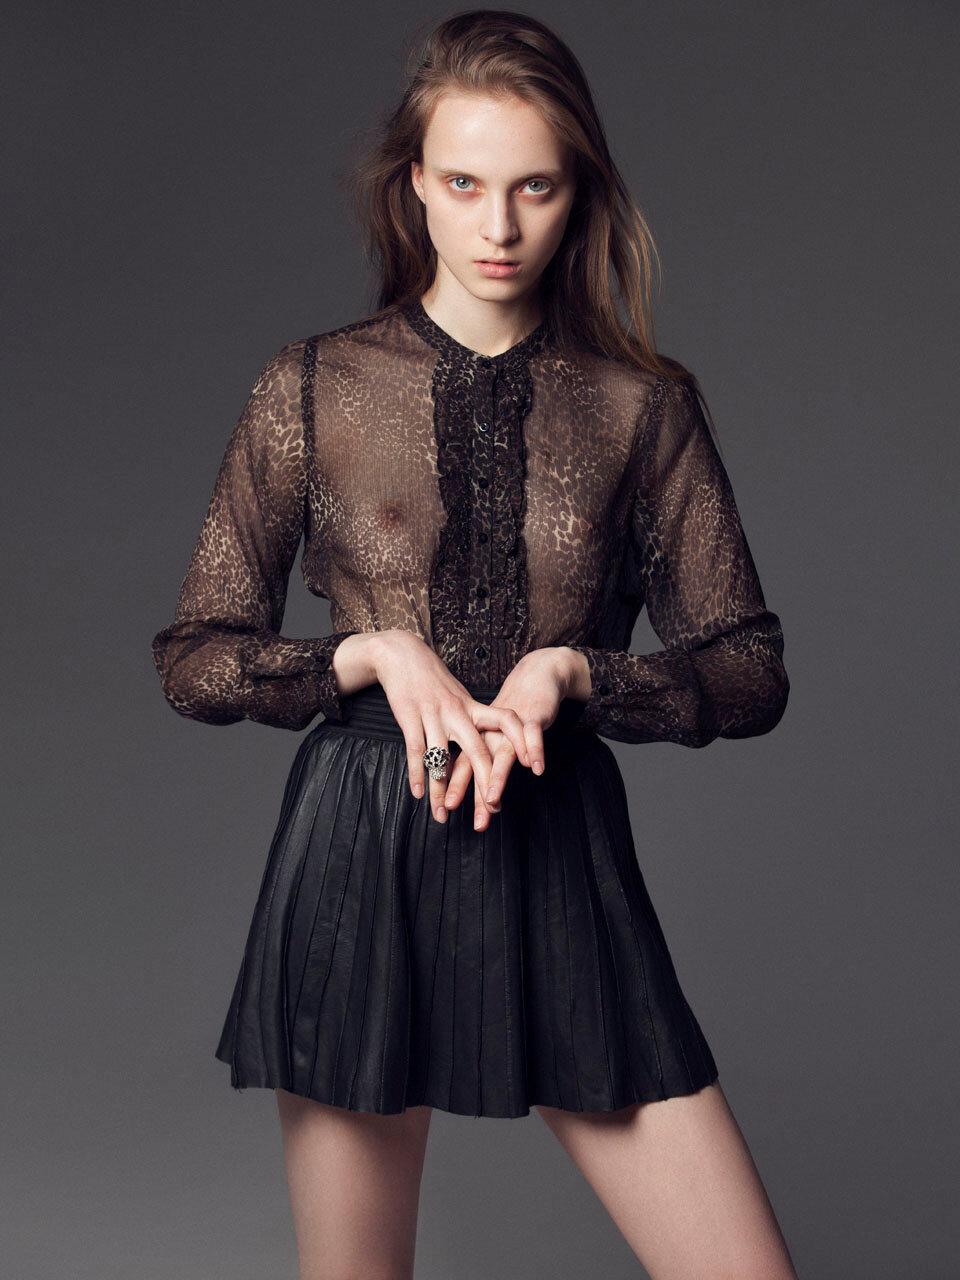 Онлайн в прозрачной блузке — pic 2